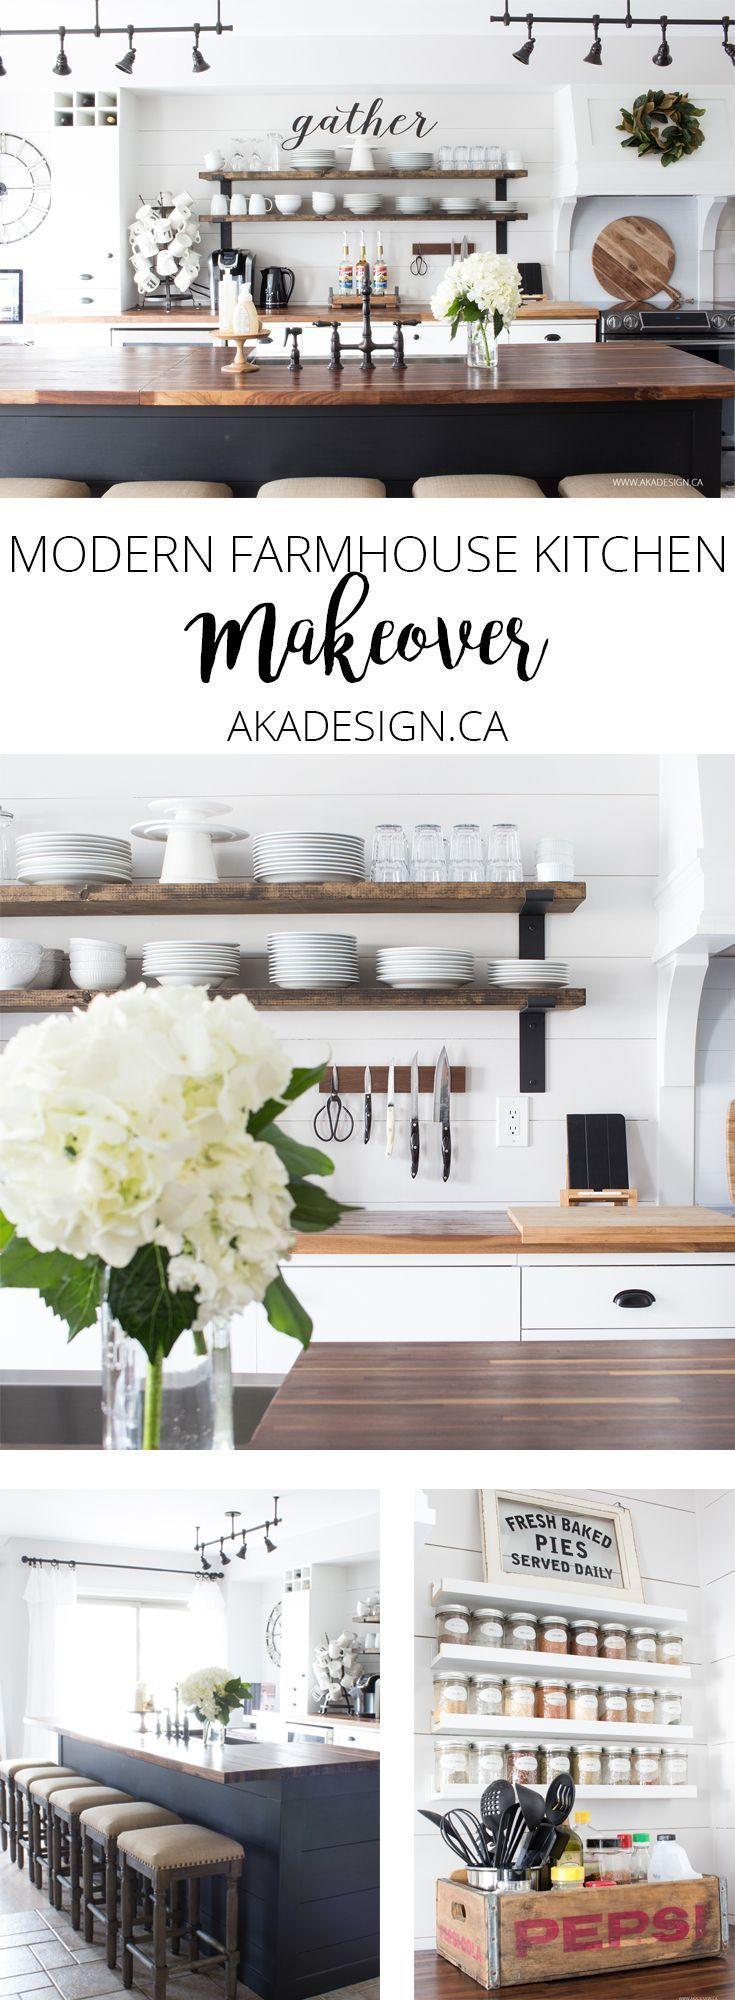 best kitchen remodeling images on pinterest kitchen ideas